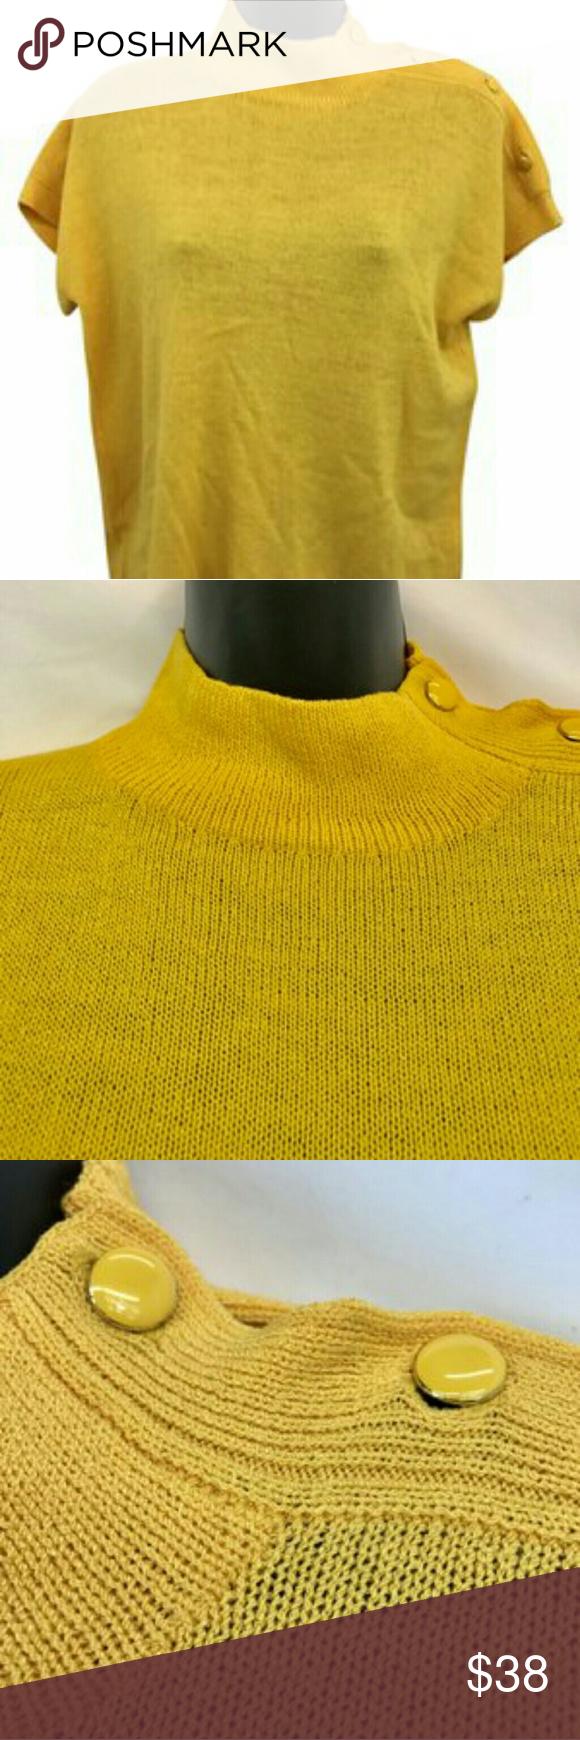 "St. John top St. John Vintage Golden Yellow High Neck Knit Top Blouse L  Made in USA  Chest across 20""  Length 23"" St. John Tops Blouses"